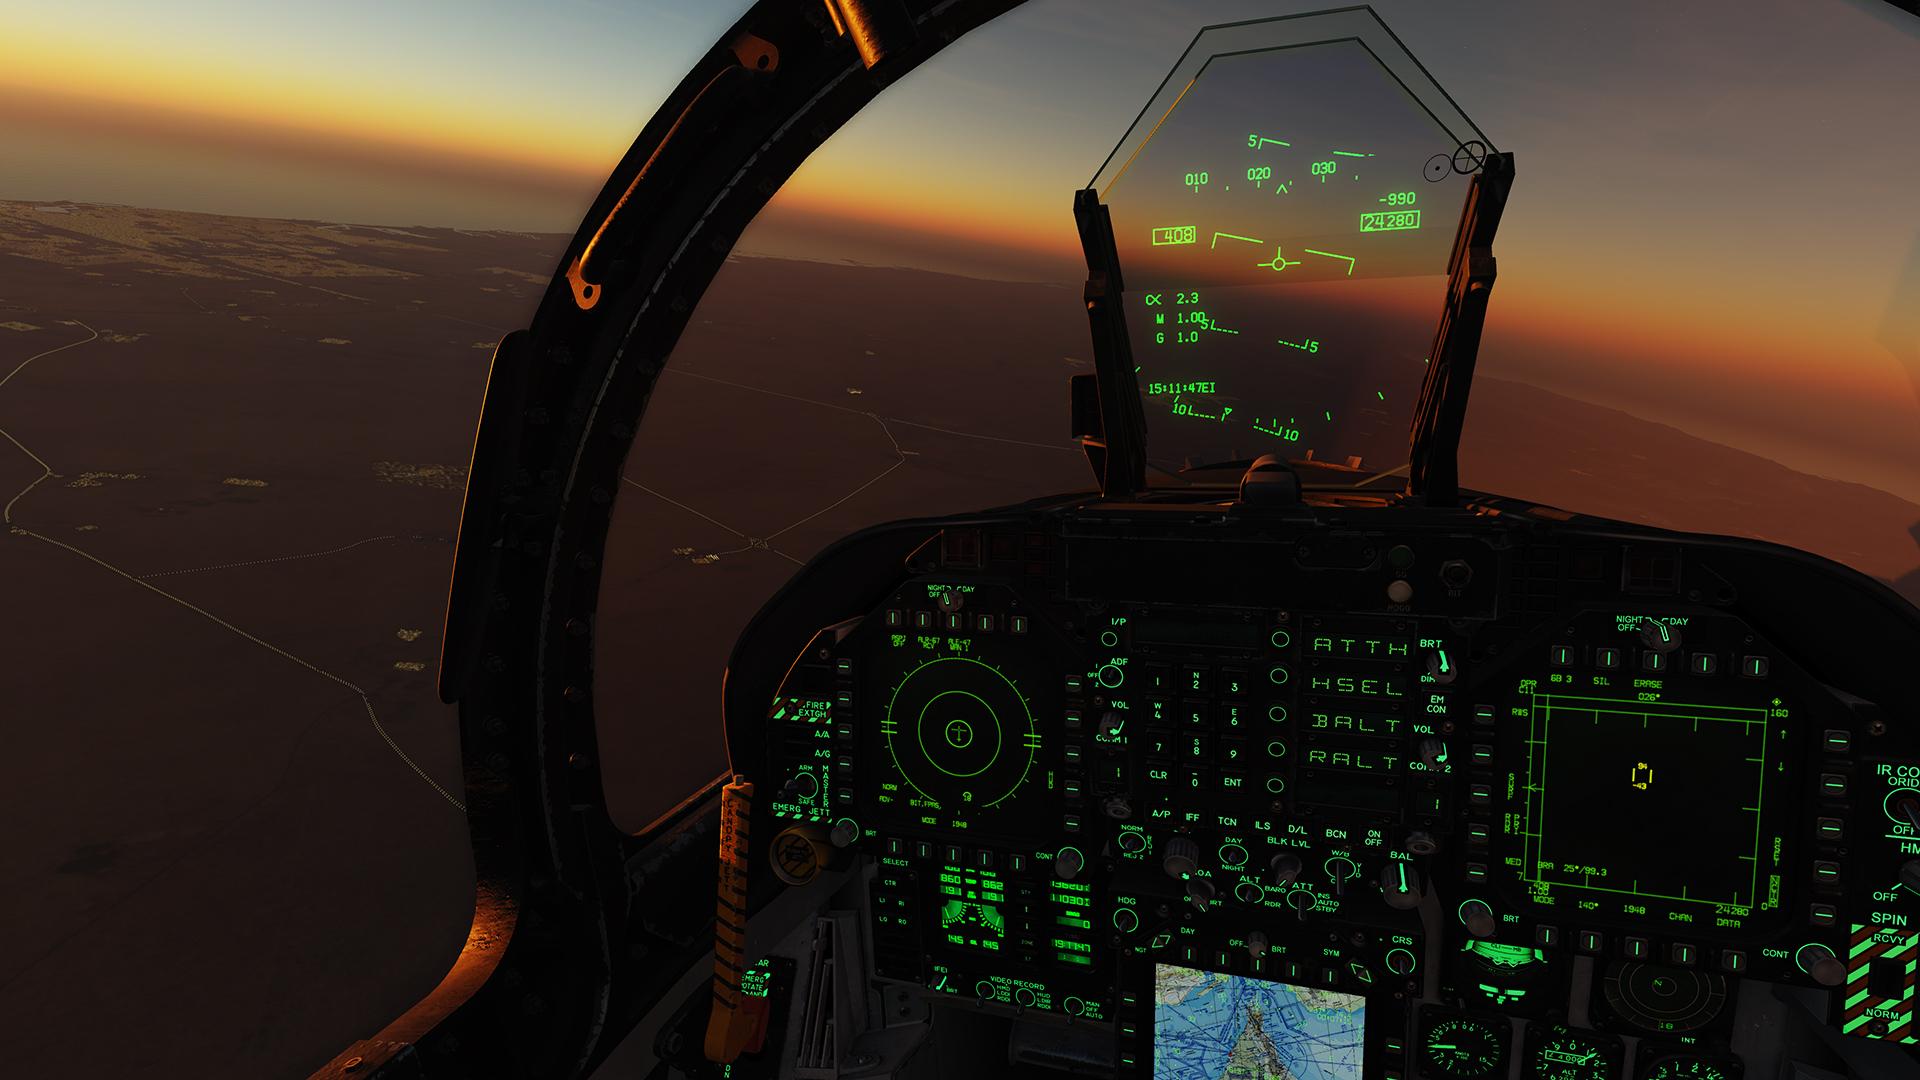 screen_200216_160934iwkkv.jpg